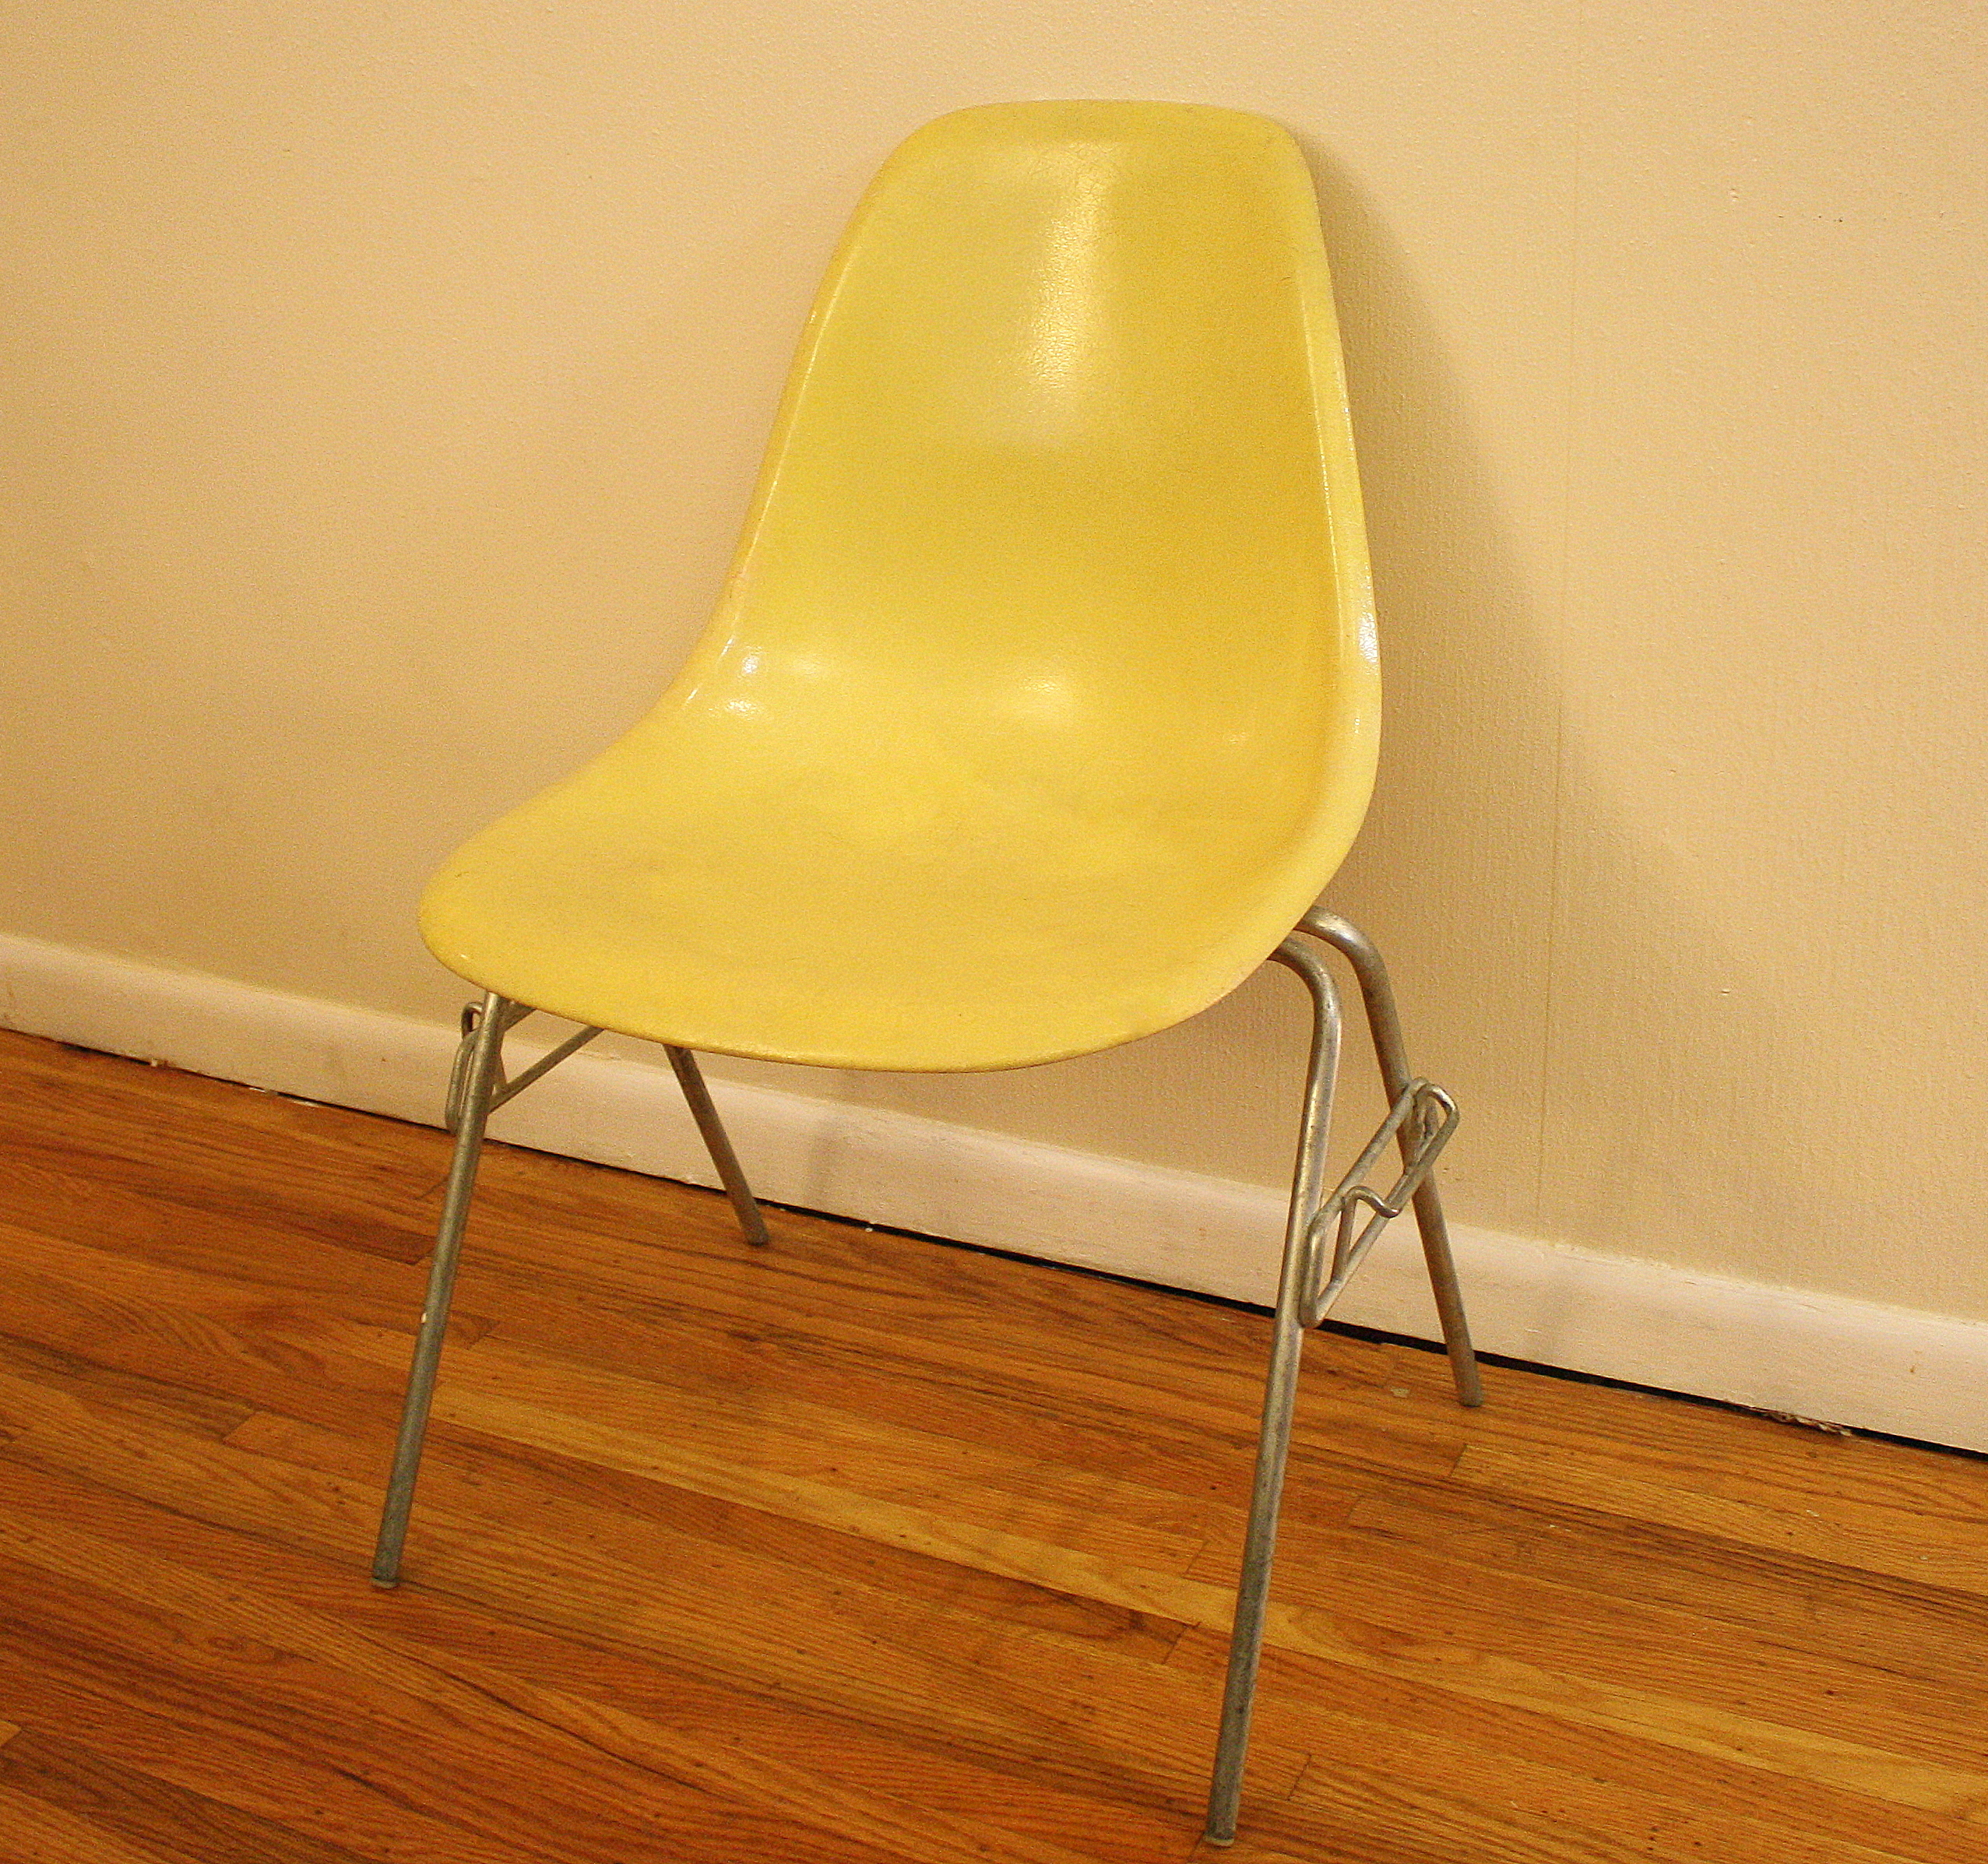 Vintage Herman Miller Chairs >> Mid Century Modern Fiberglass Chairs by Herman Miller ...